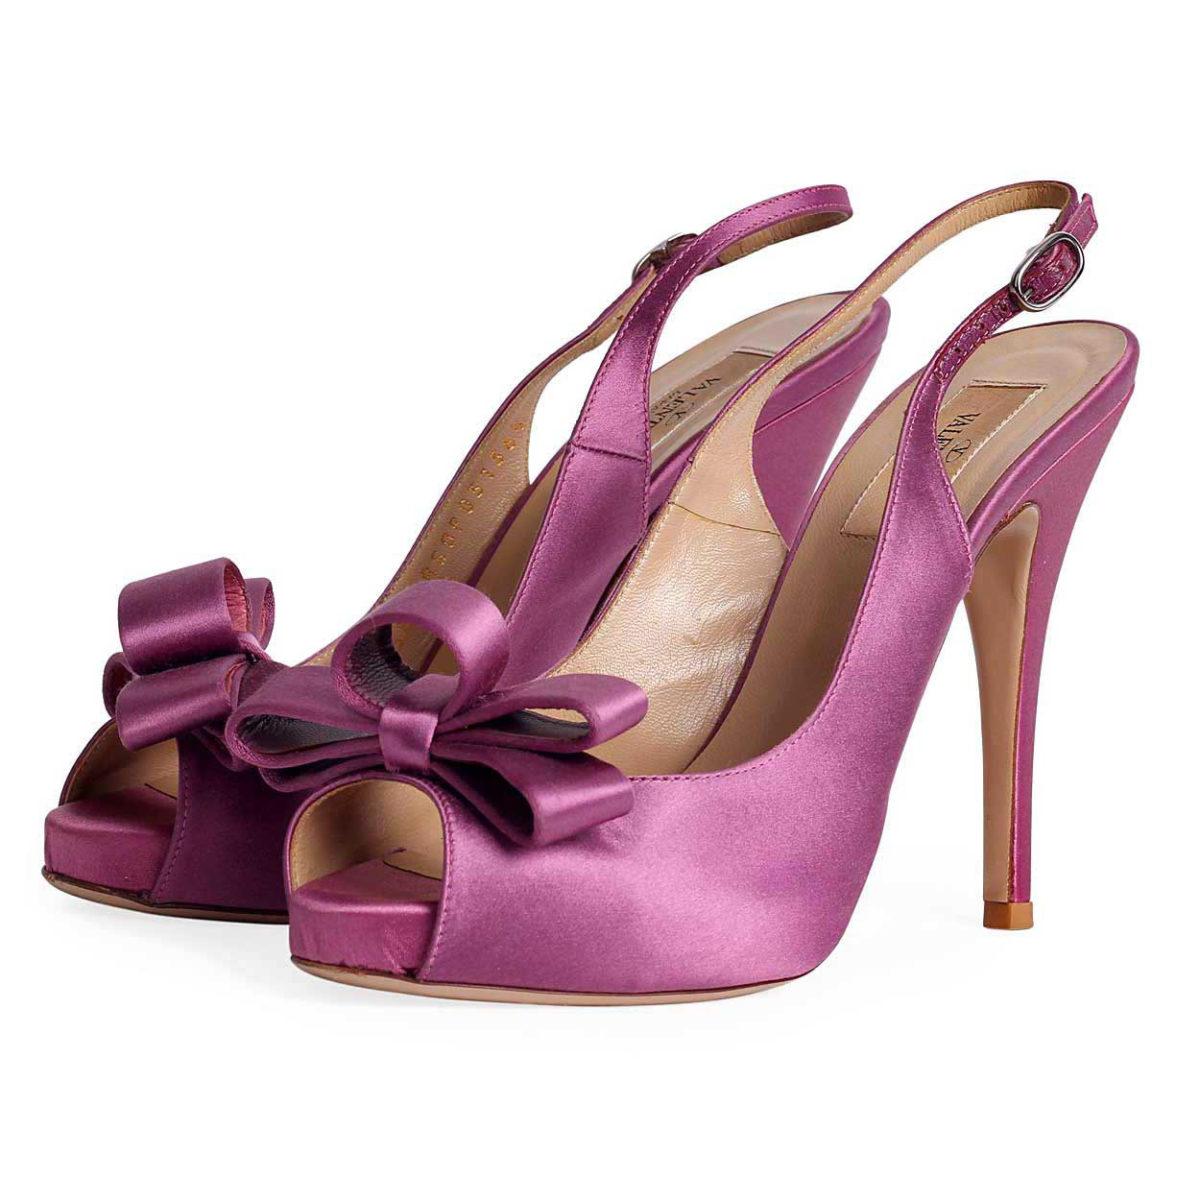 f80051cb5ed VALENTINO Open Toe Satin Slingback Heels with Bow Detail – S  36.5 ...